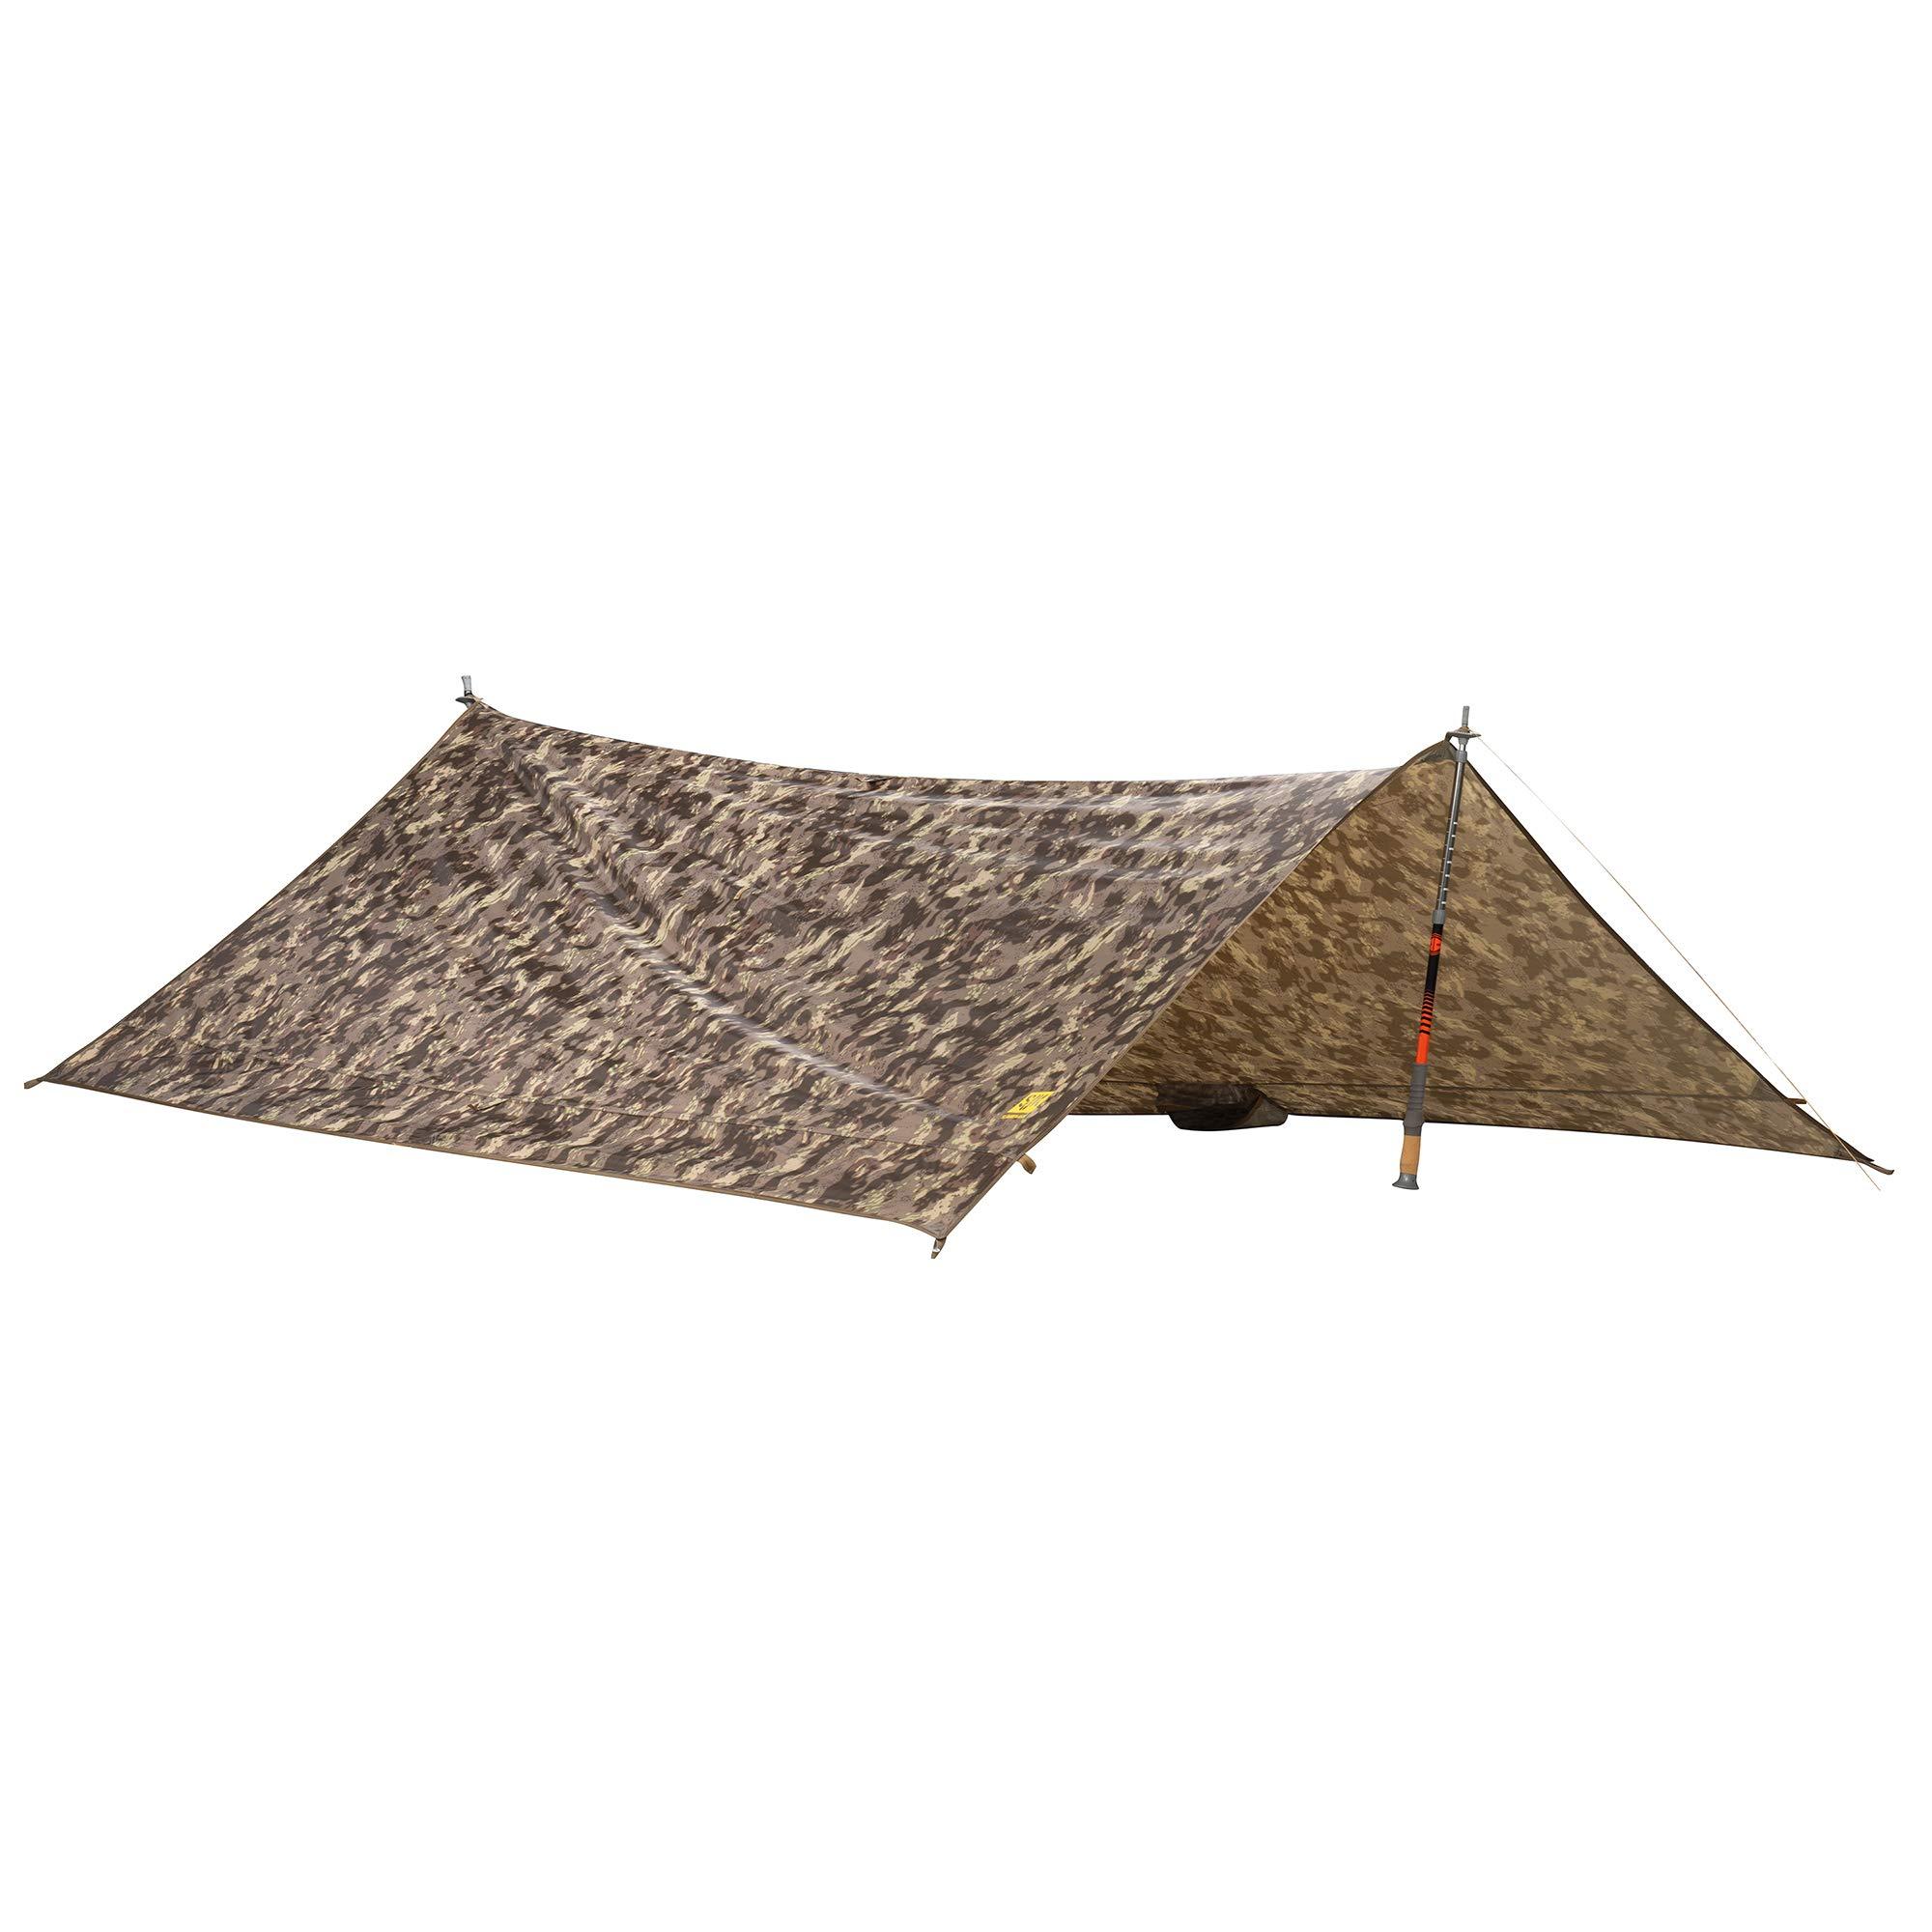 Slumberjack Satellite Tarp & Shelter, Highlander - 10'x8.5' - Compact, Lighweight, Waterproof, Multi-Pitch Camping Tarp by Slumberjack